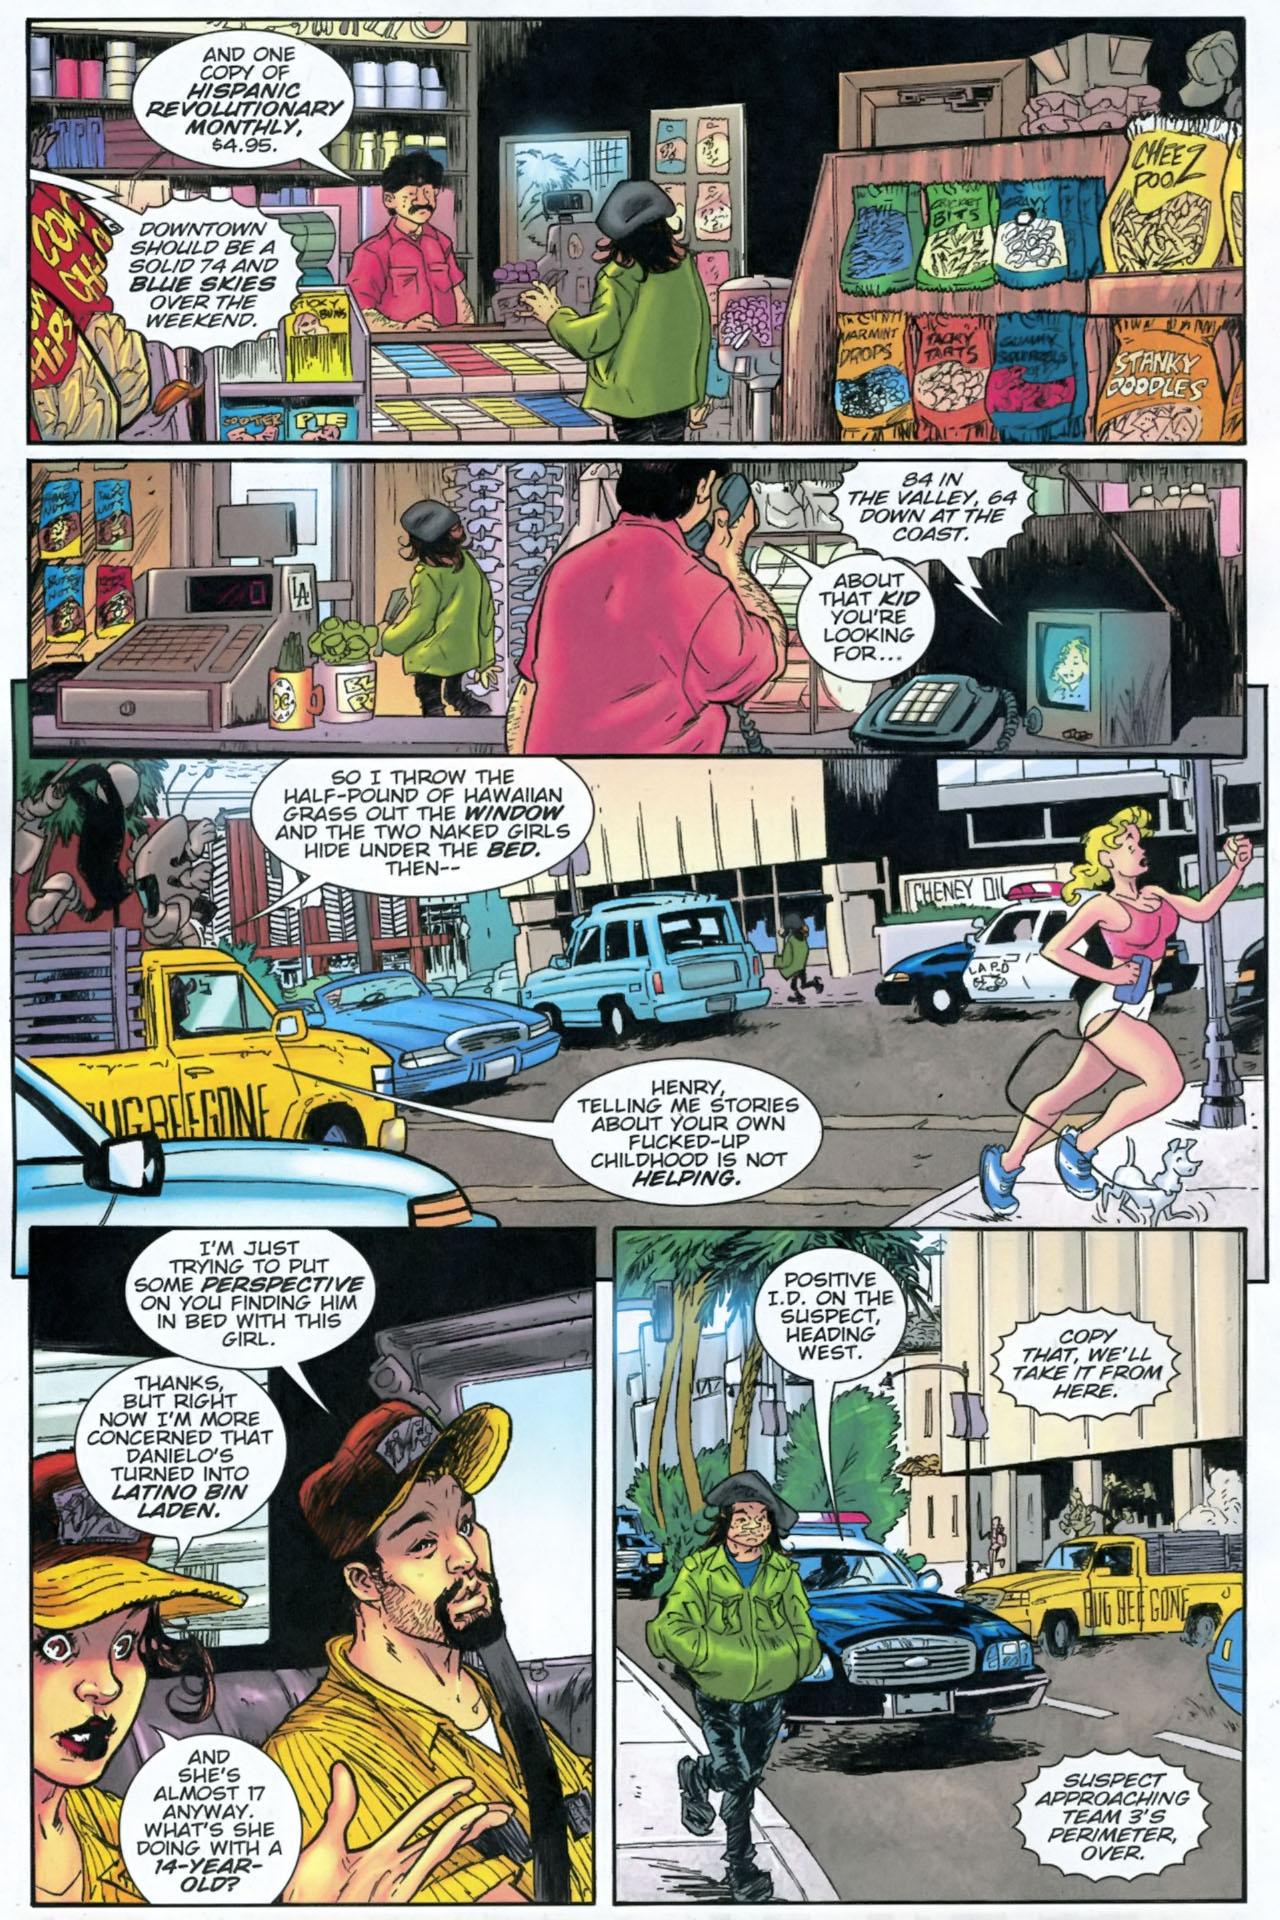 Read online The Exterminators comic -  Issue #27 - 14